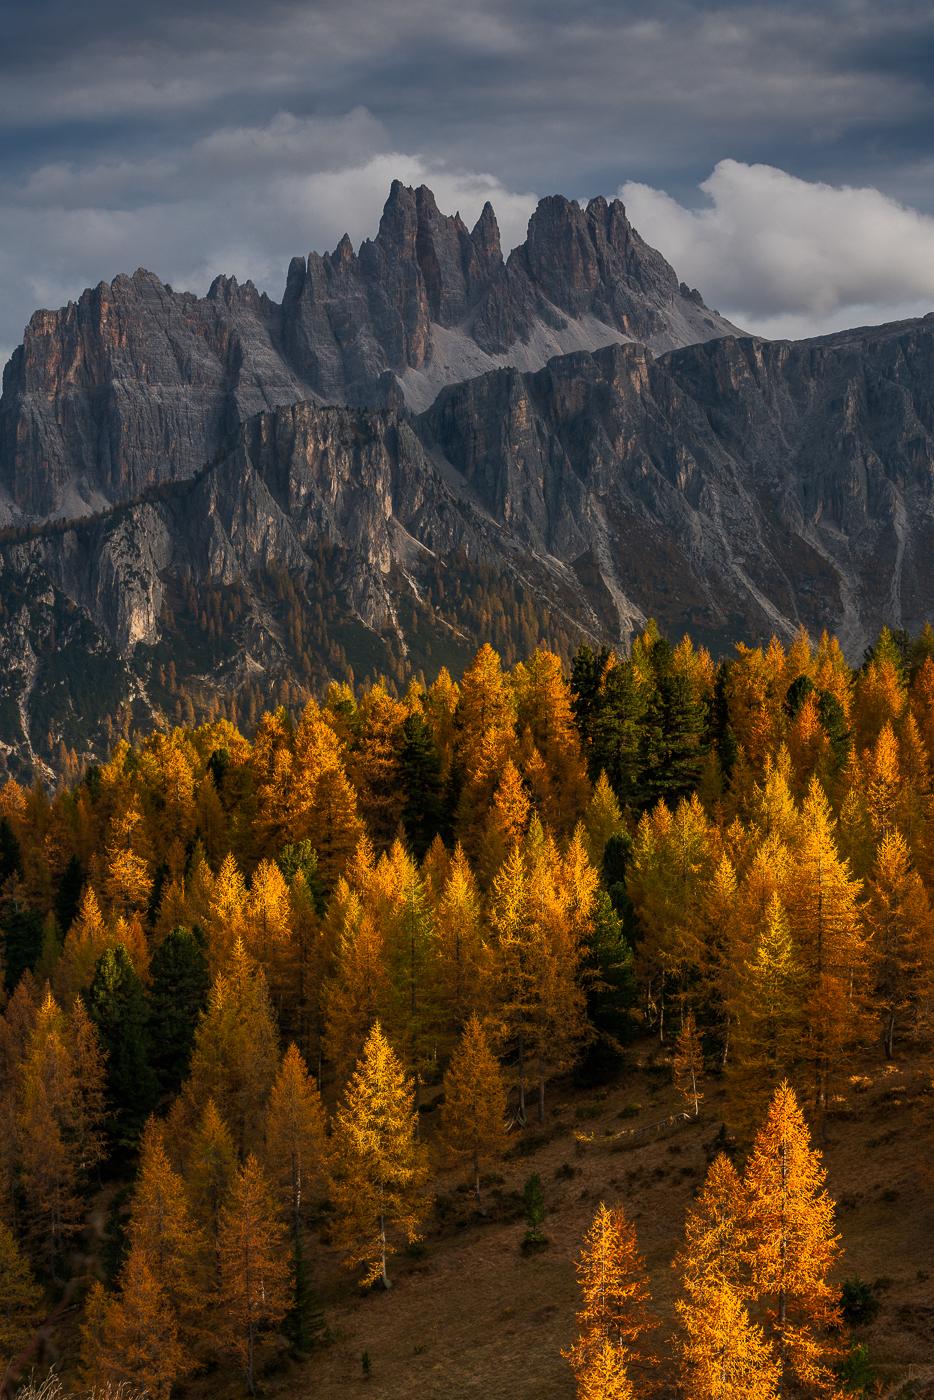 dolomites-italie-nicolas-rottiers-photographe-paysage-normandie